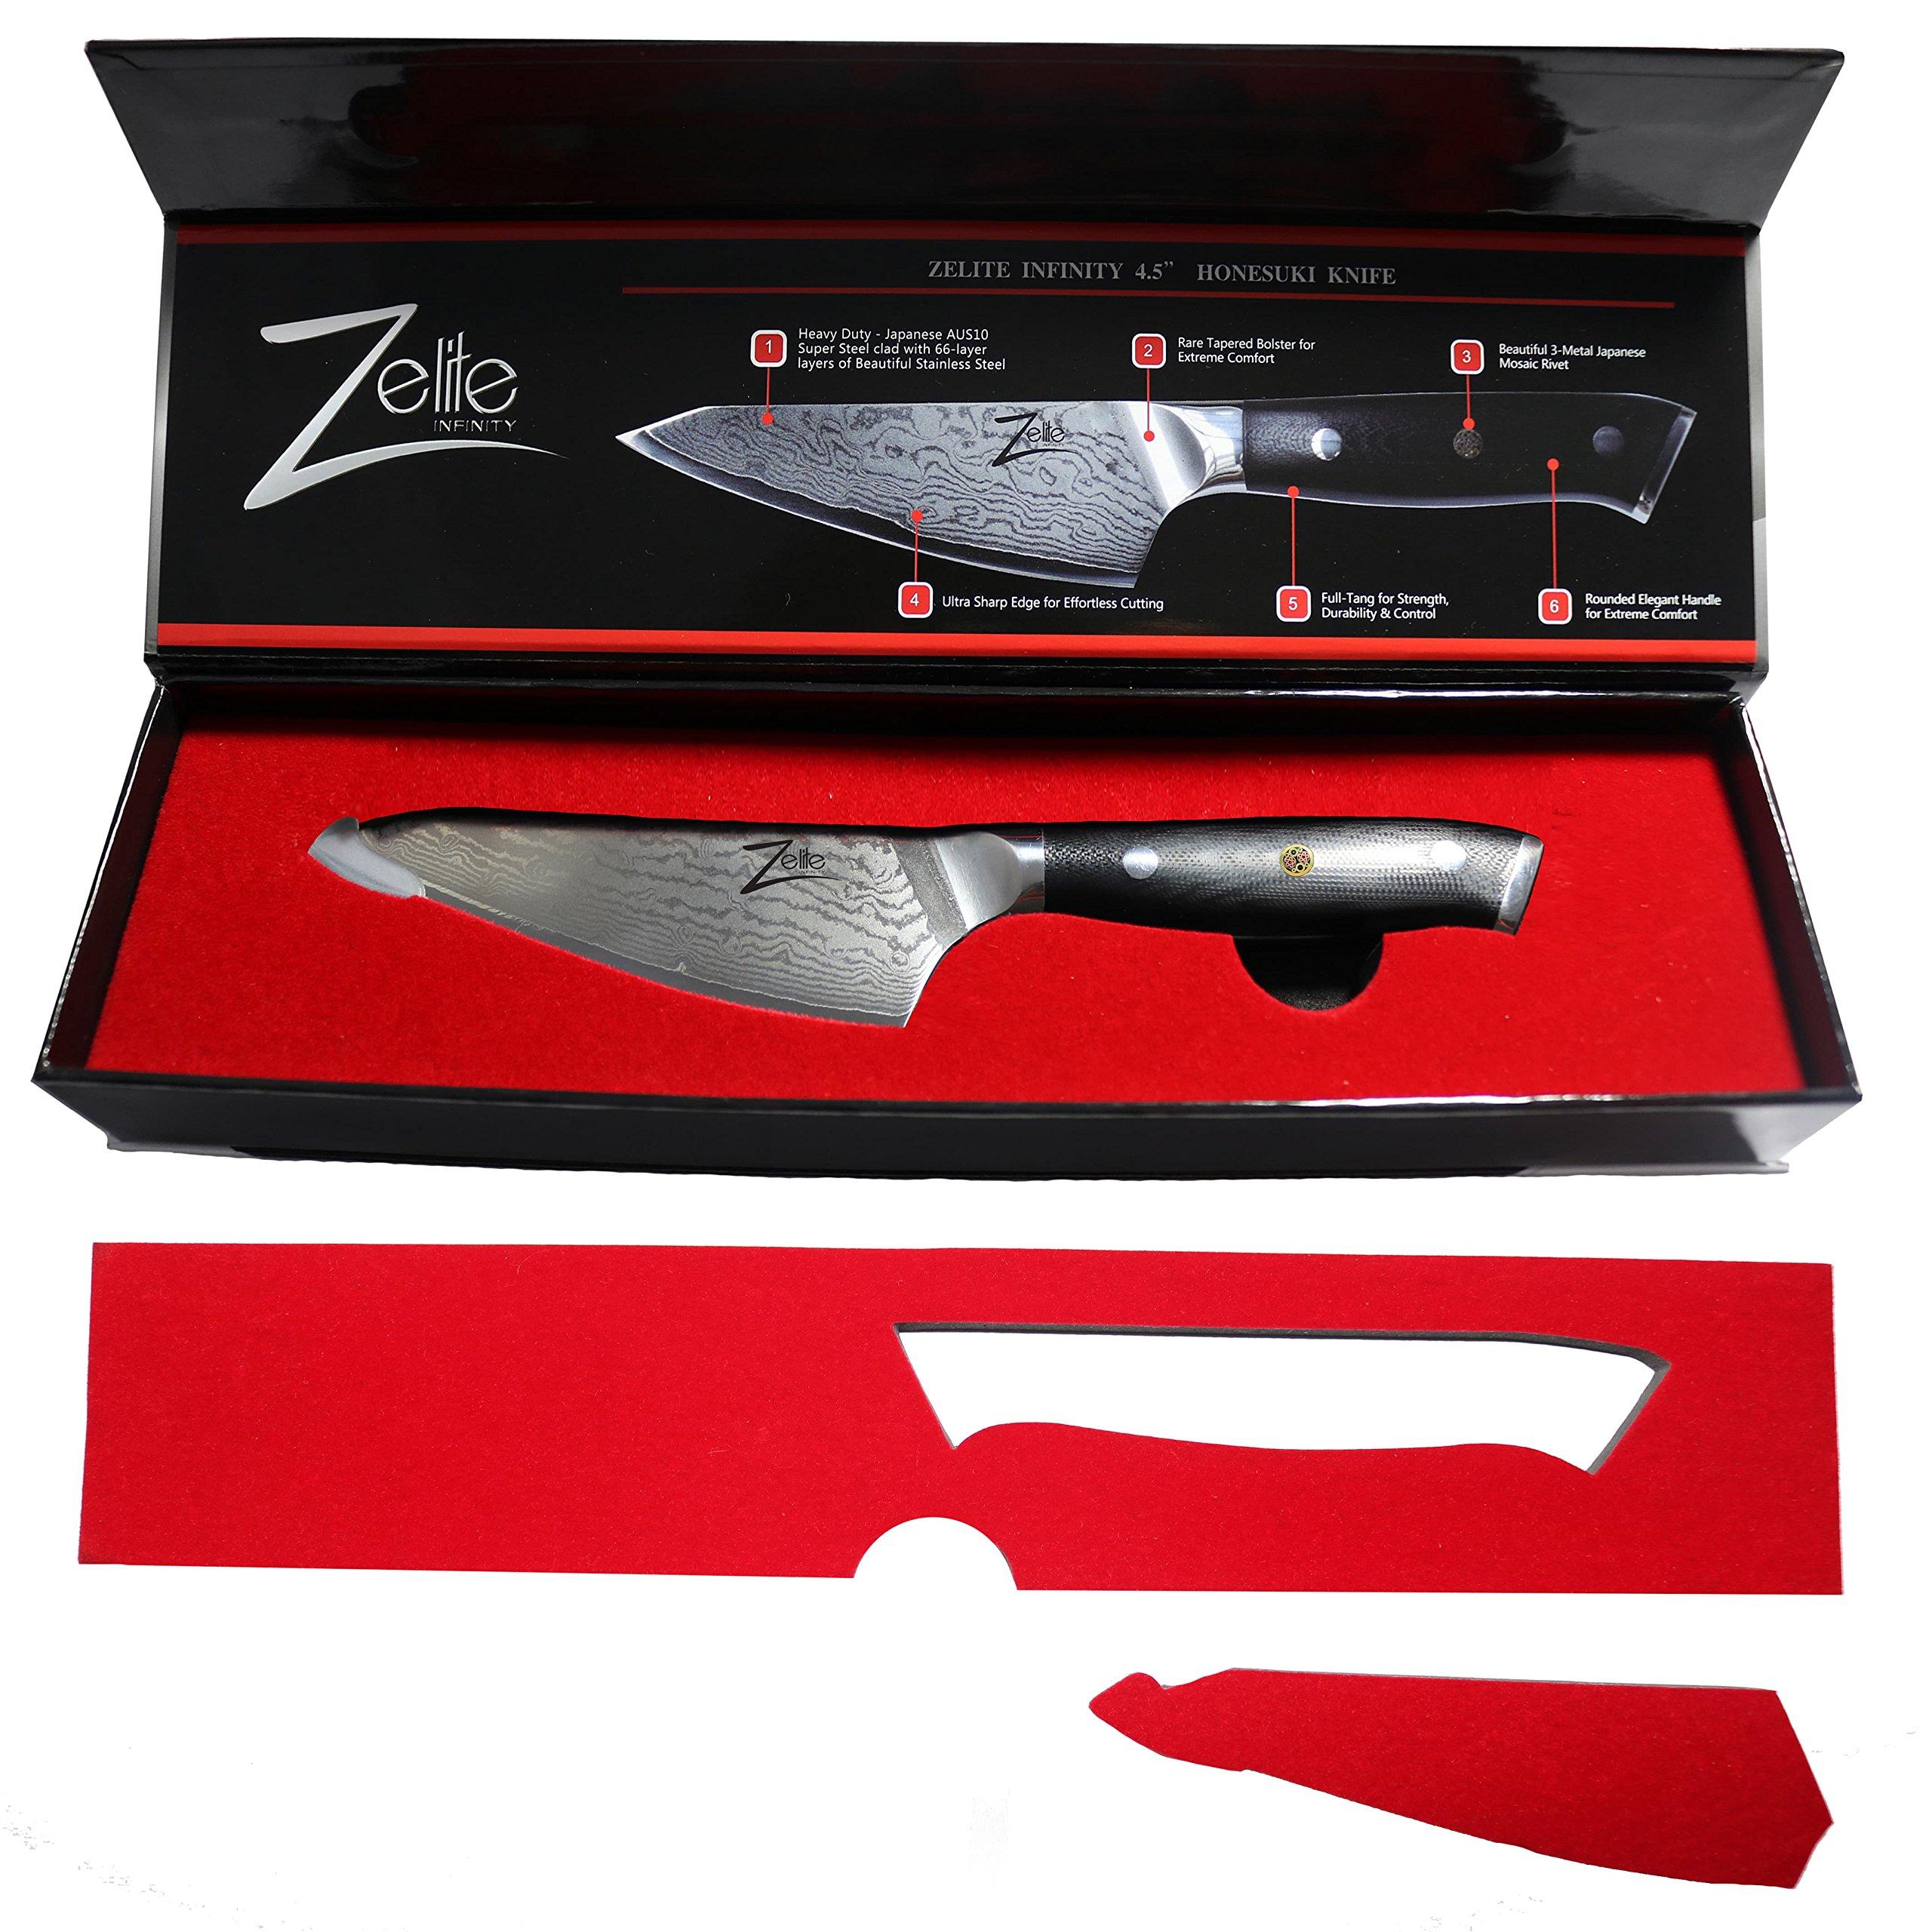 ZELITE INFINITY Honesuki Knife 4.5 inch - Alpha-Royal Series - Best Quality Japanese AUS10 Super Steel 67 Layer Damascus - Razor Sharp, Deep Blade, Versatile Boning Knives Specifically for Chicken by Zelite Infinity (Image #2)